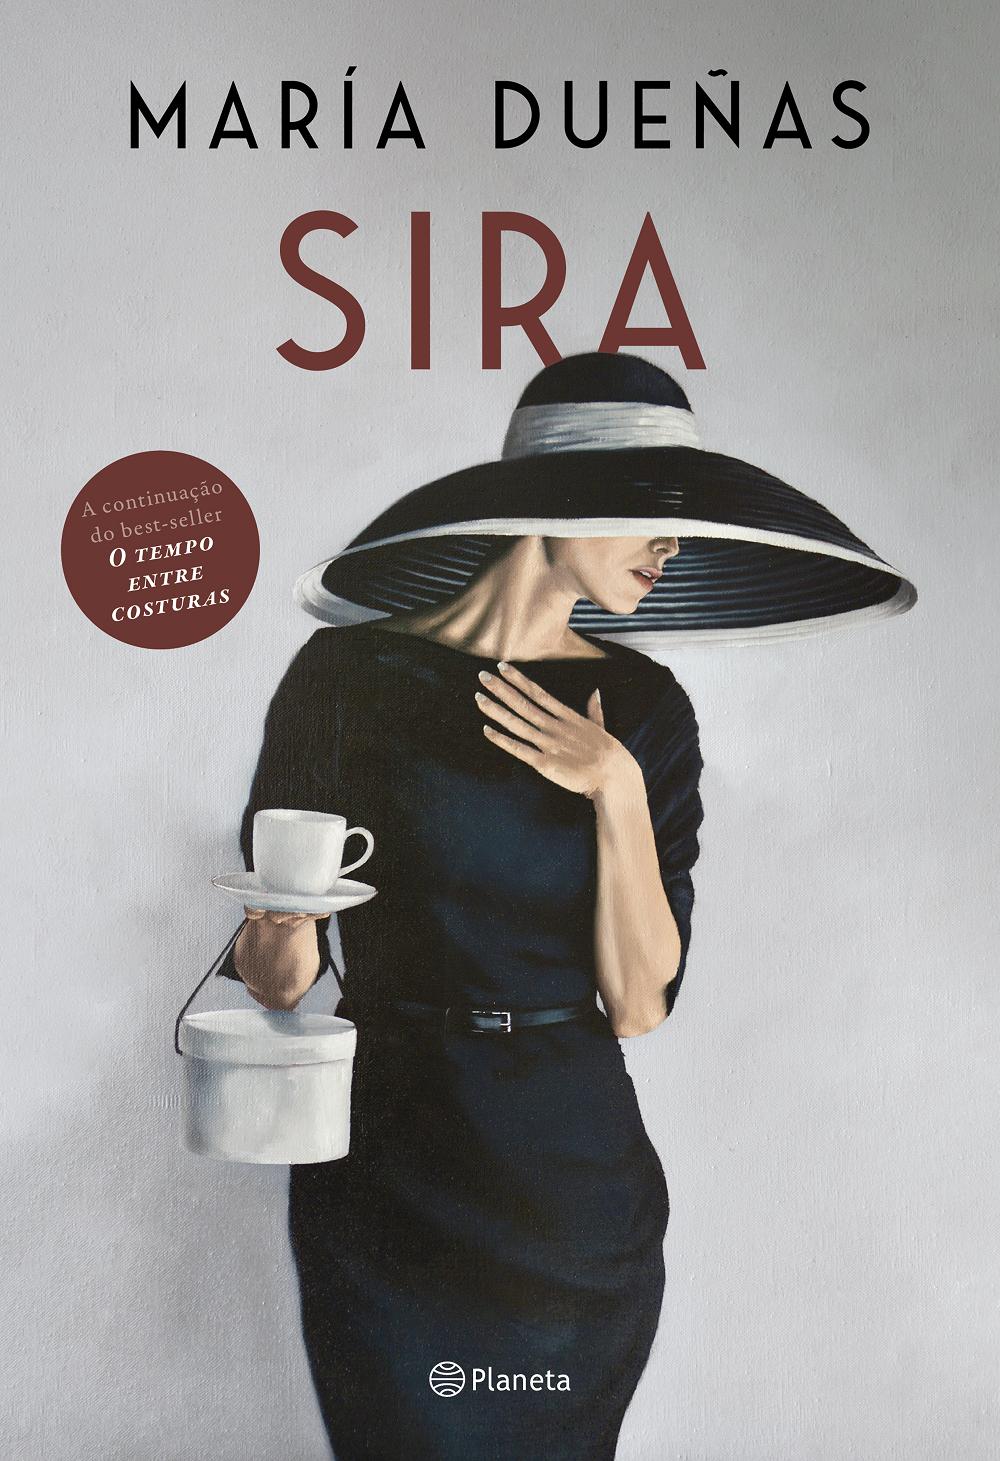 sira-Maria-Duenas-livro-capa